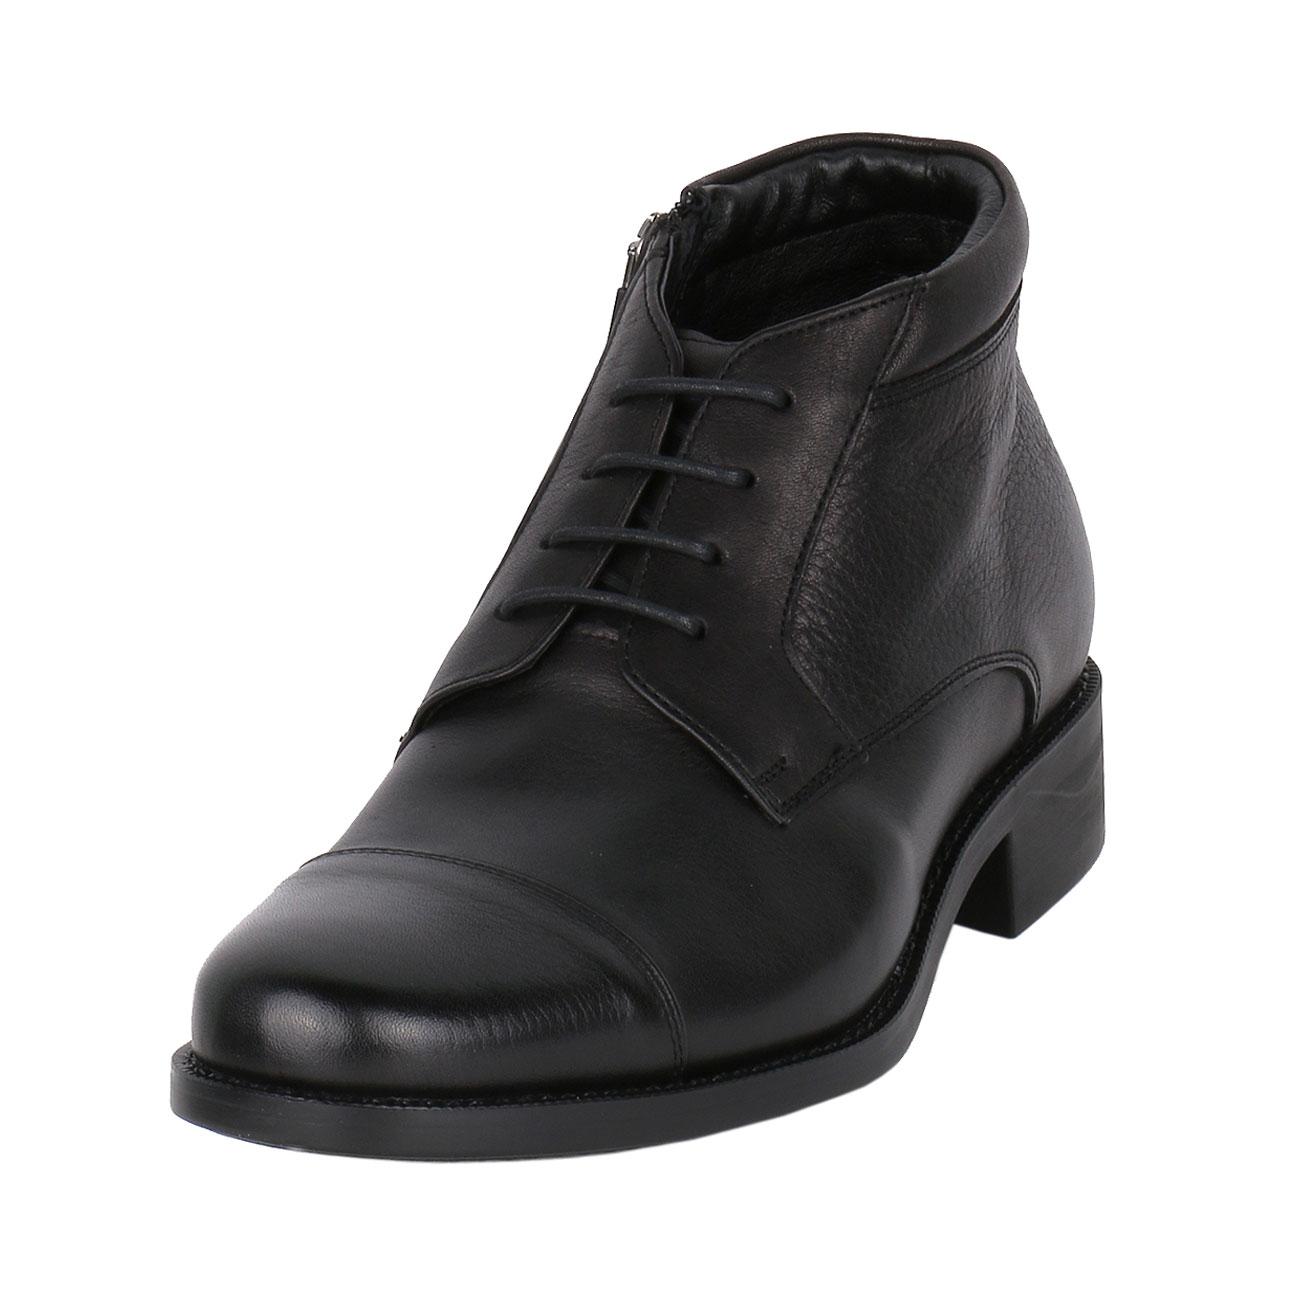 Height Enhancing Men's Leather Chukka Semi Dress Boot